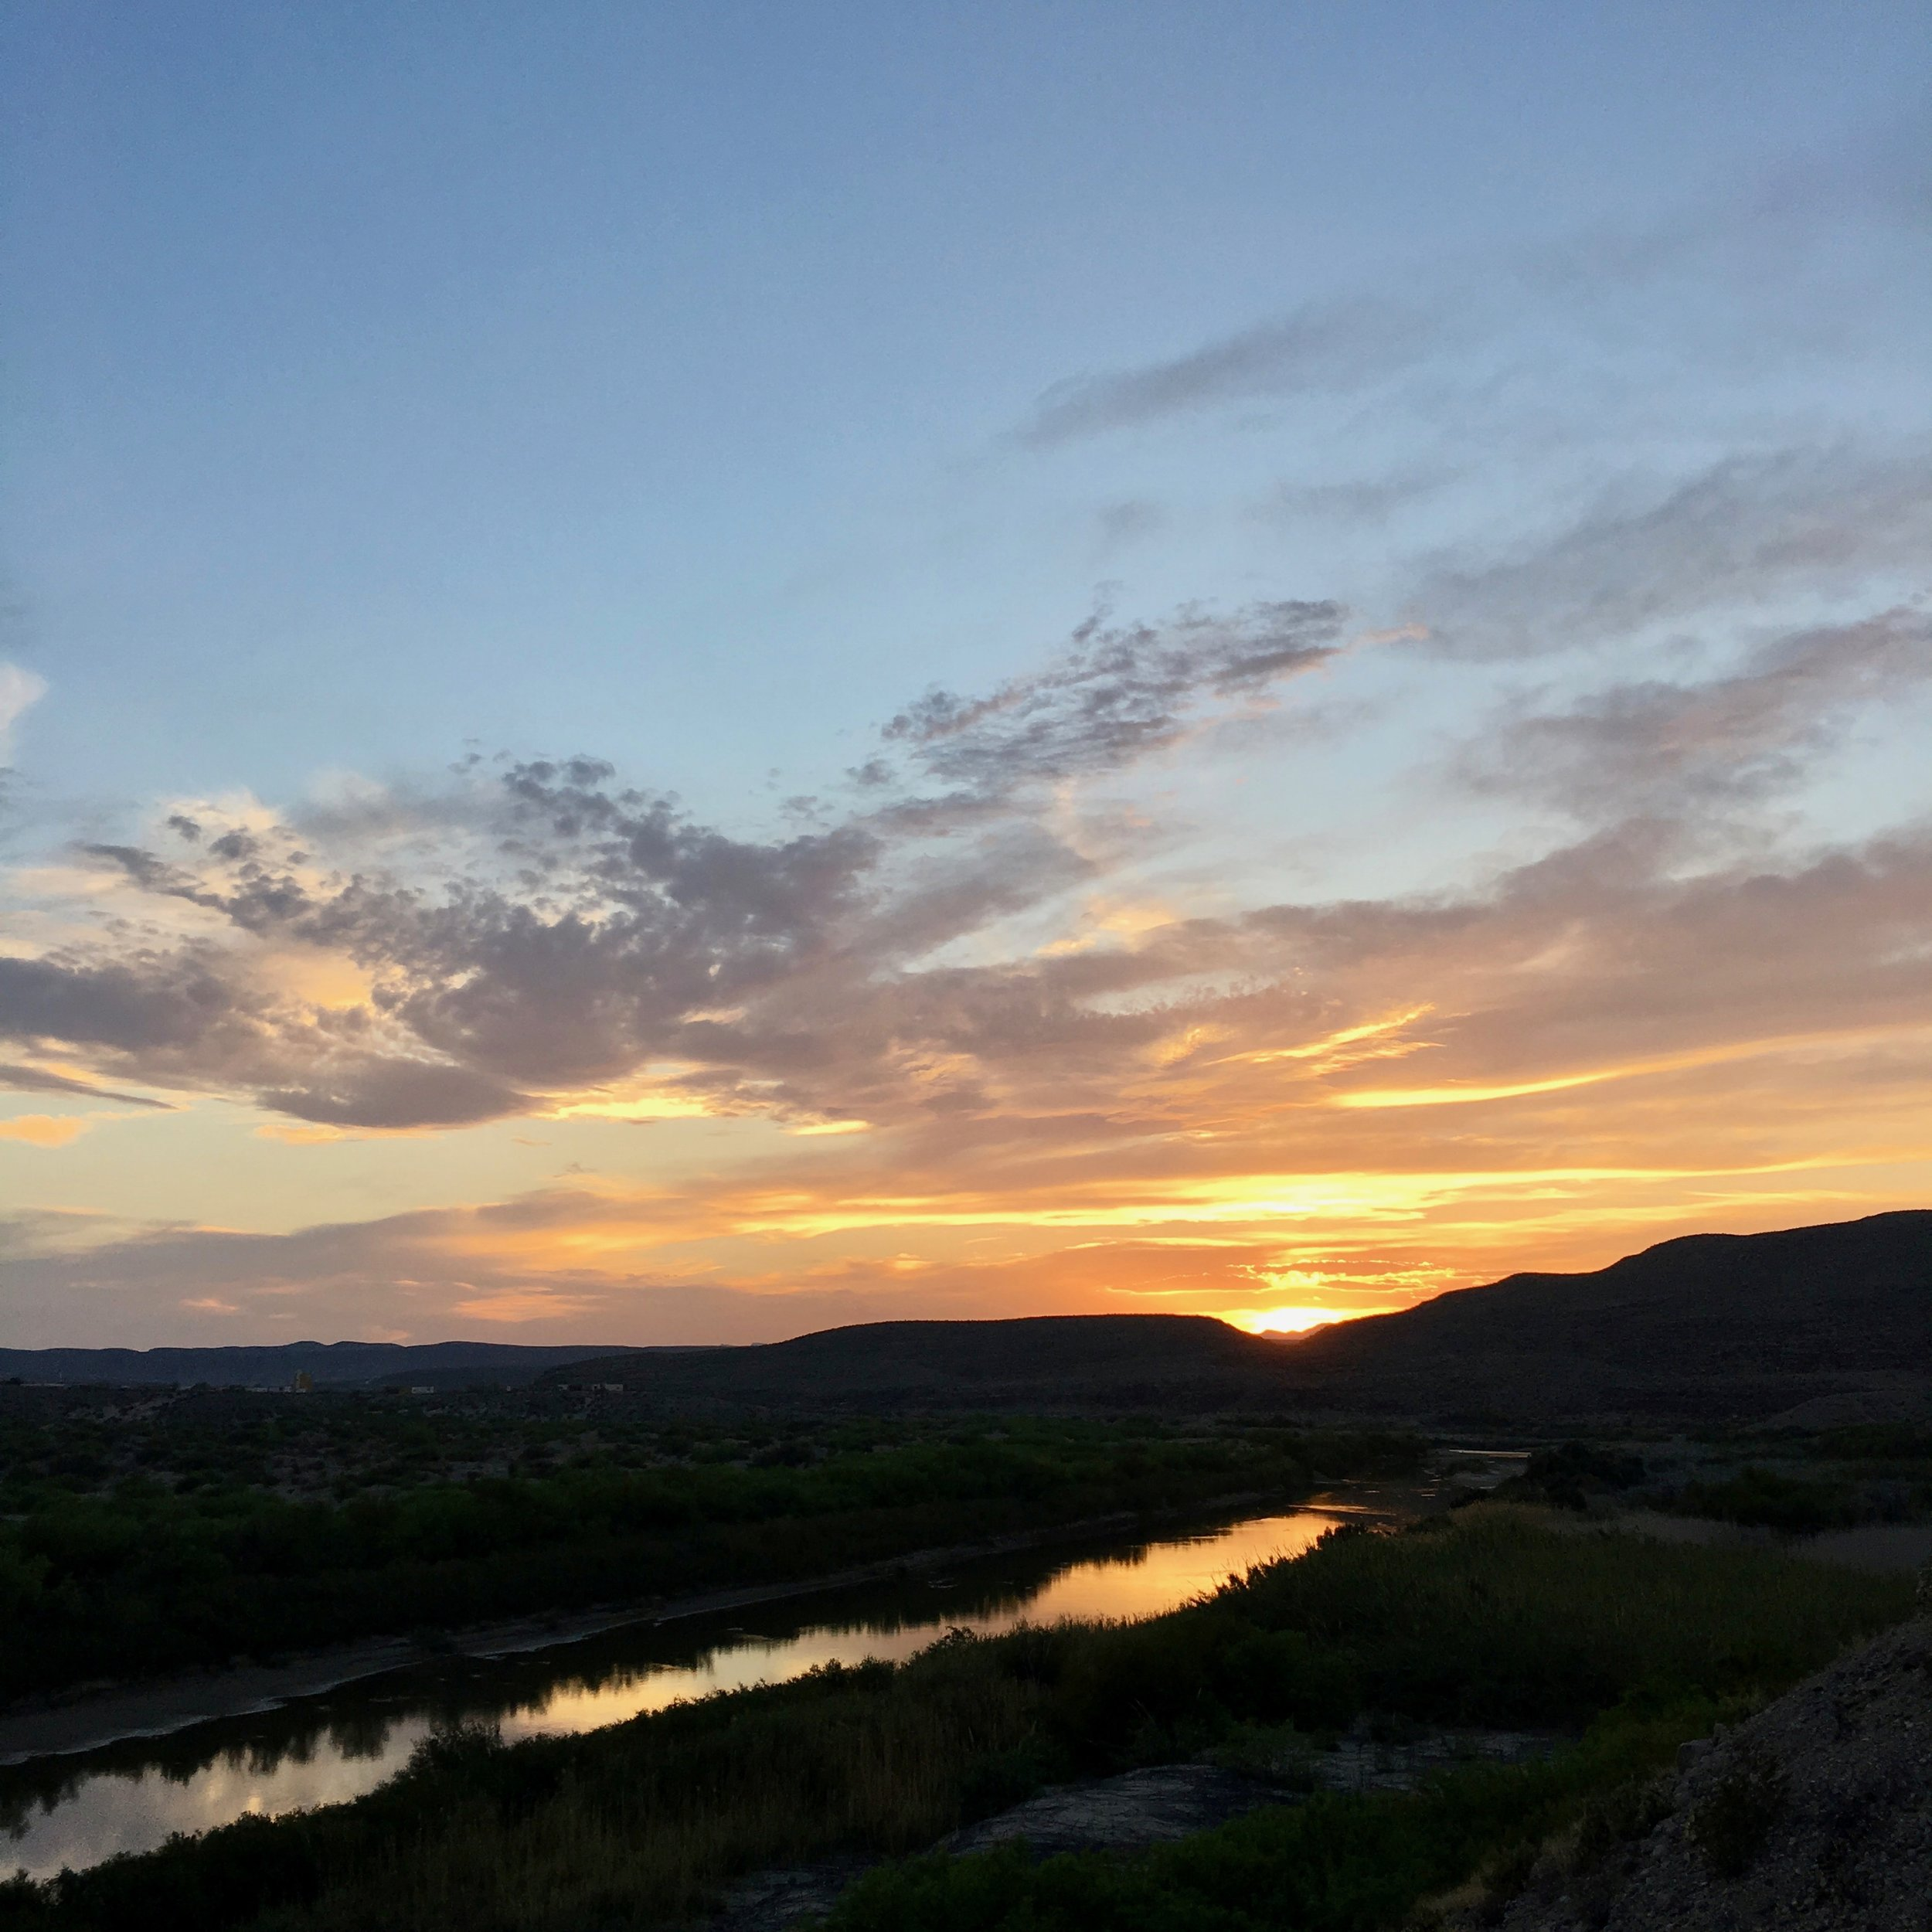 Sunset over The Rio Grande.